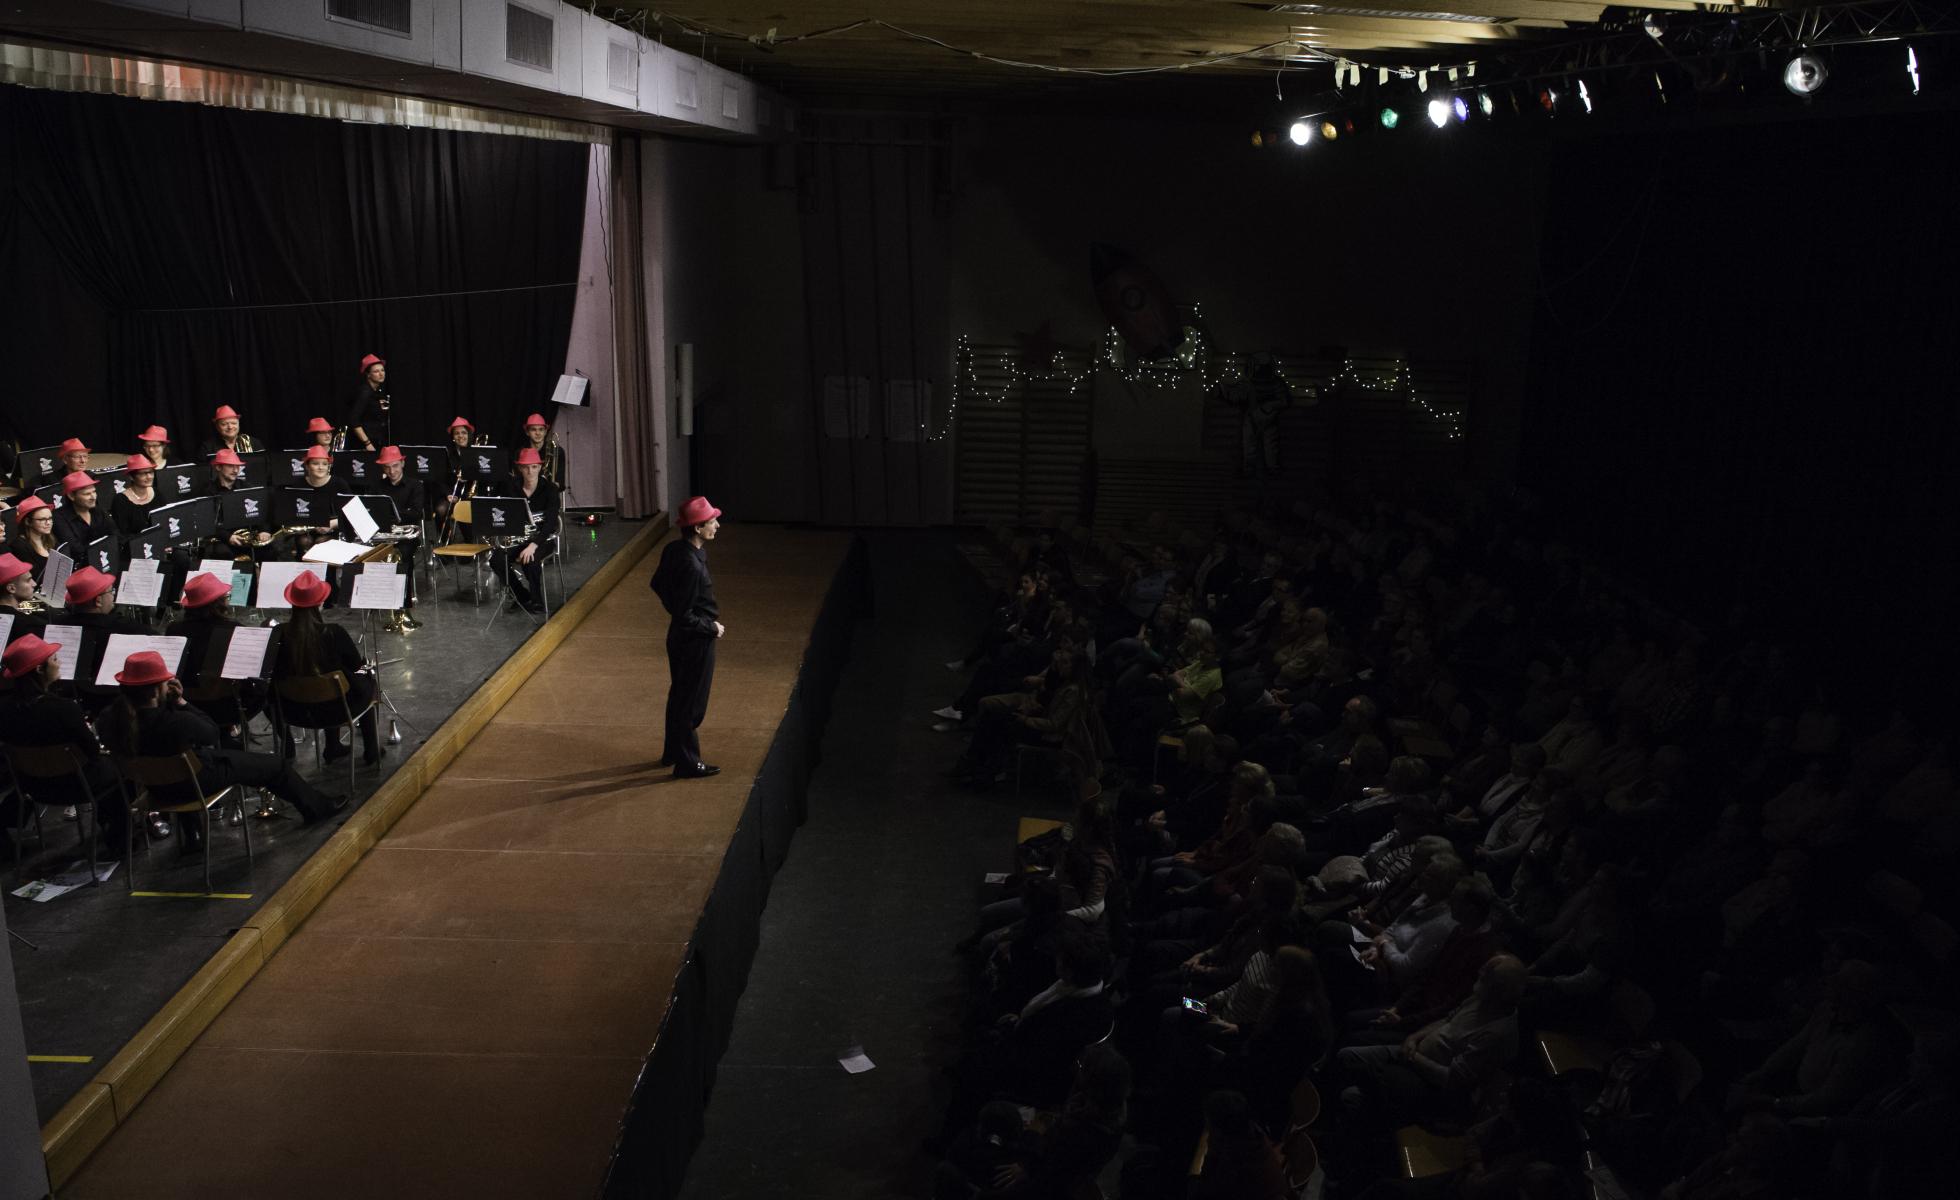 170211_concert_annuel17-062